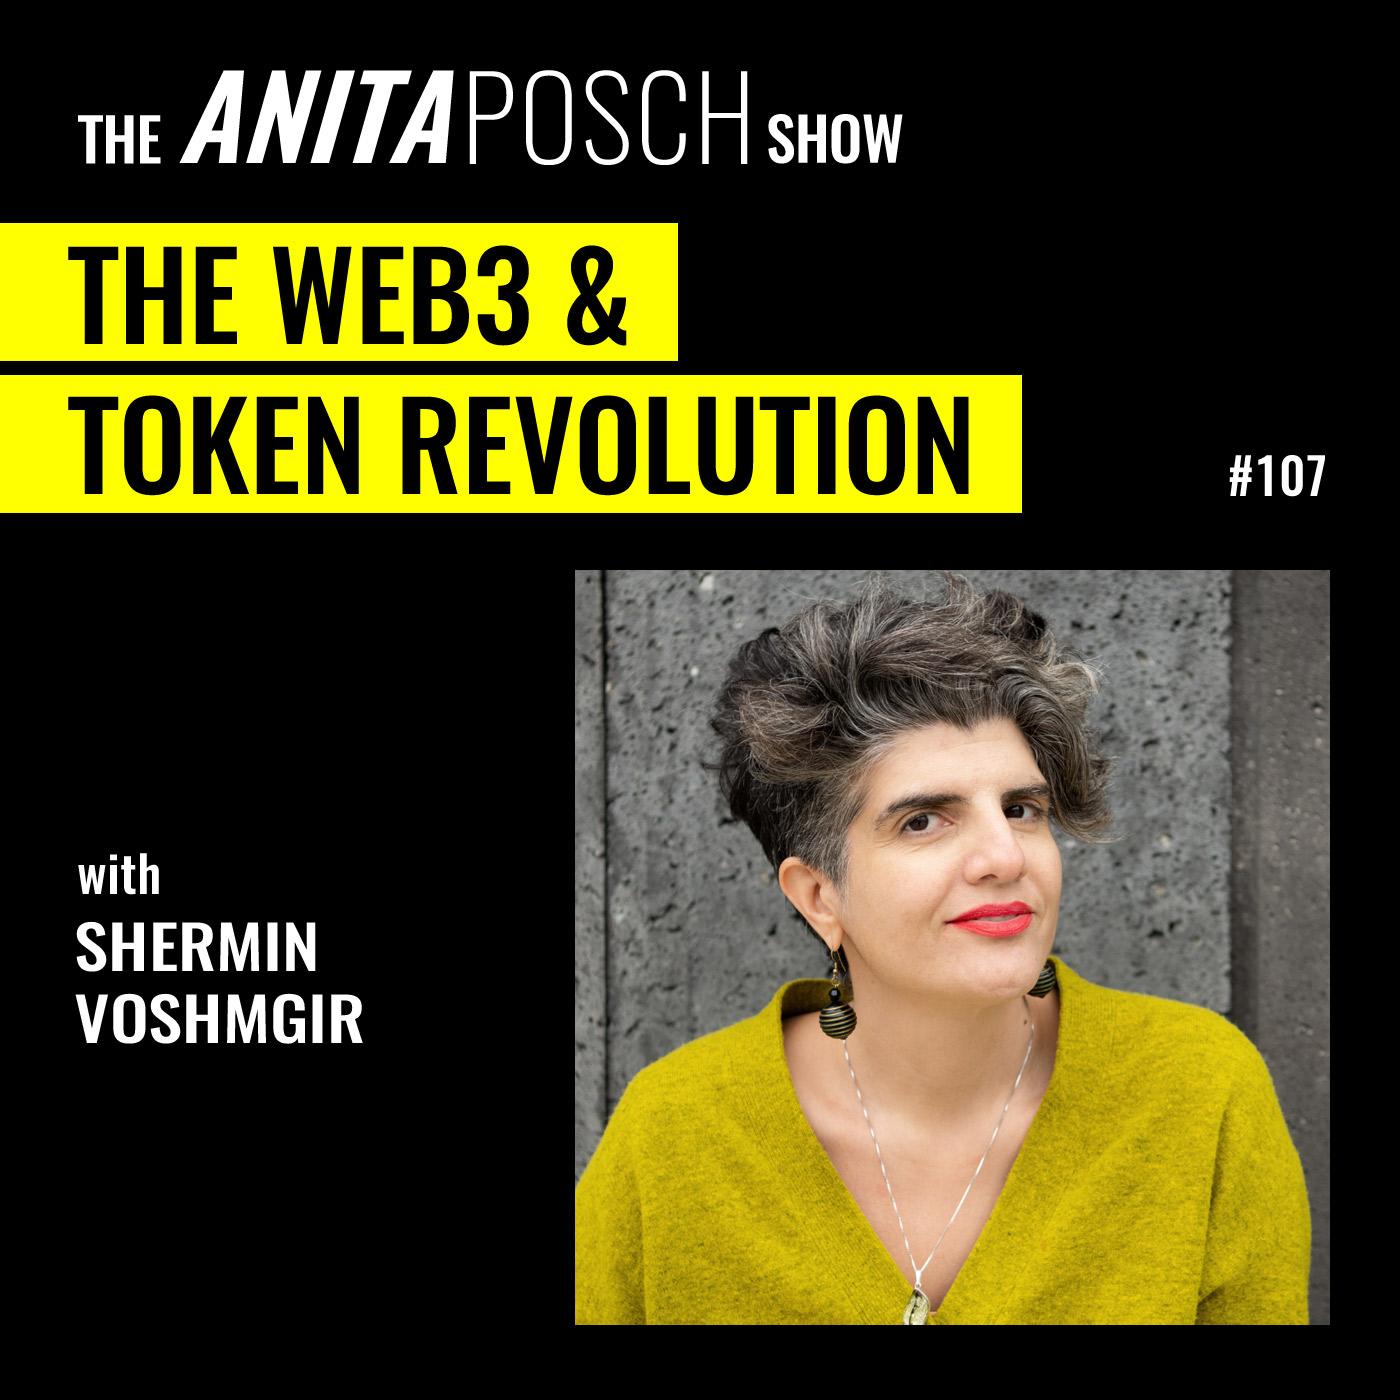 Shermin Voshmgir: The Web 3 and Token Revolution